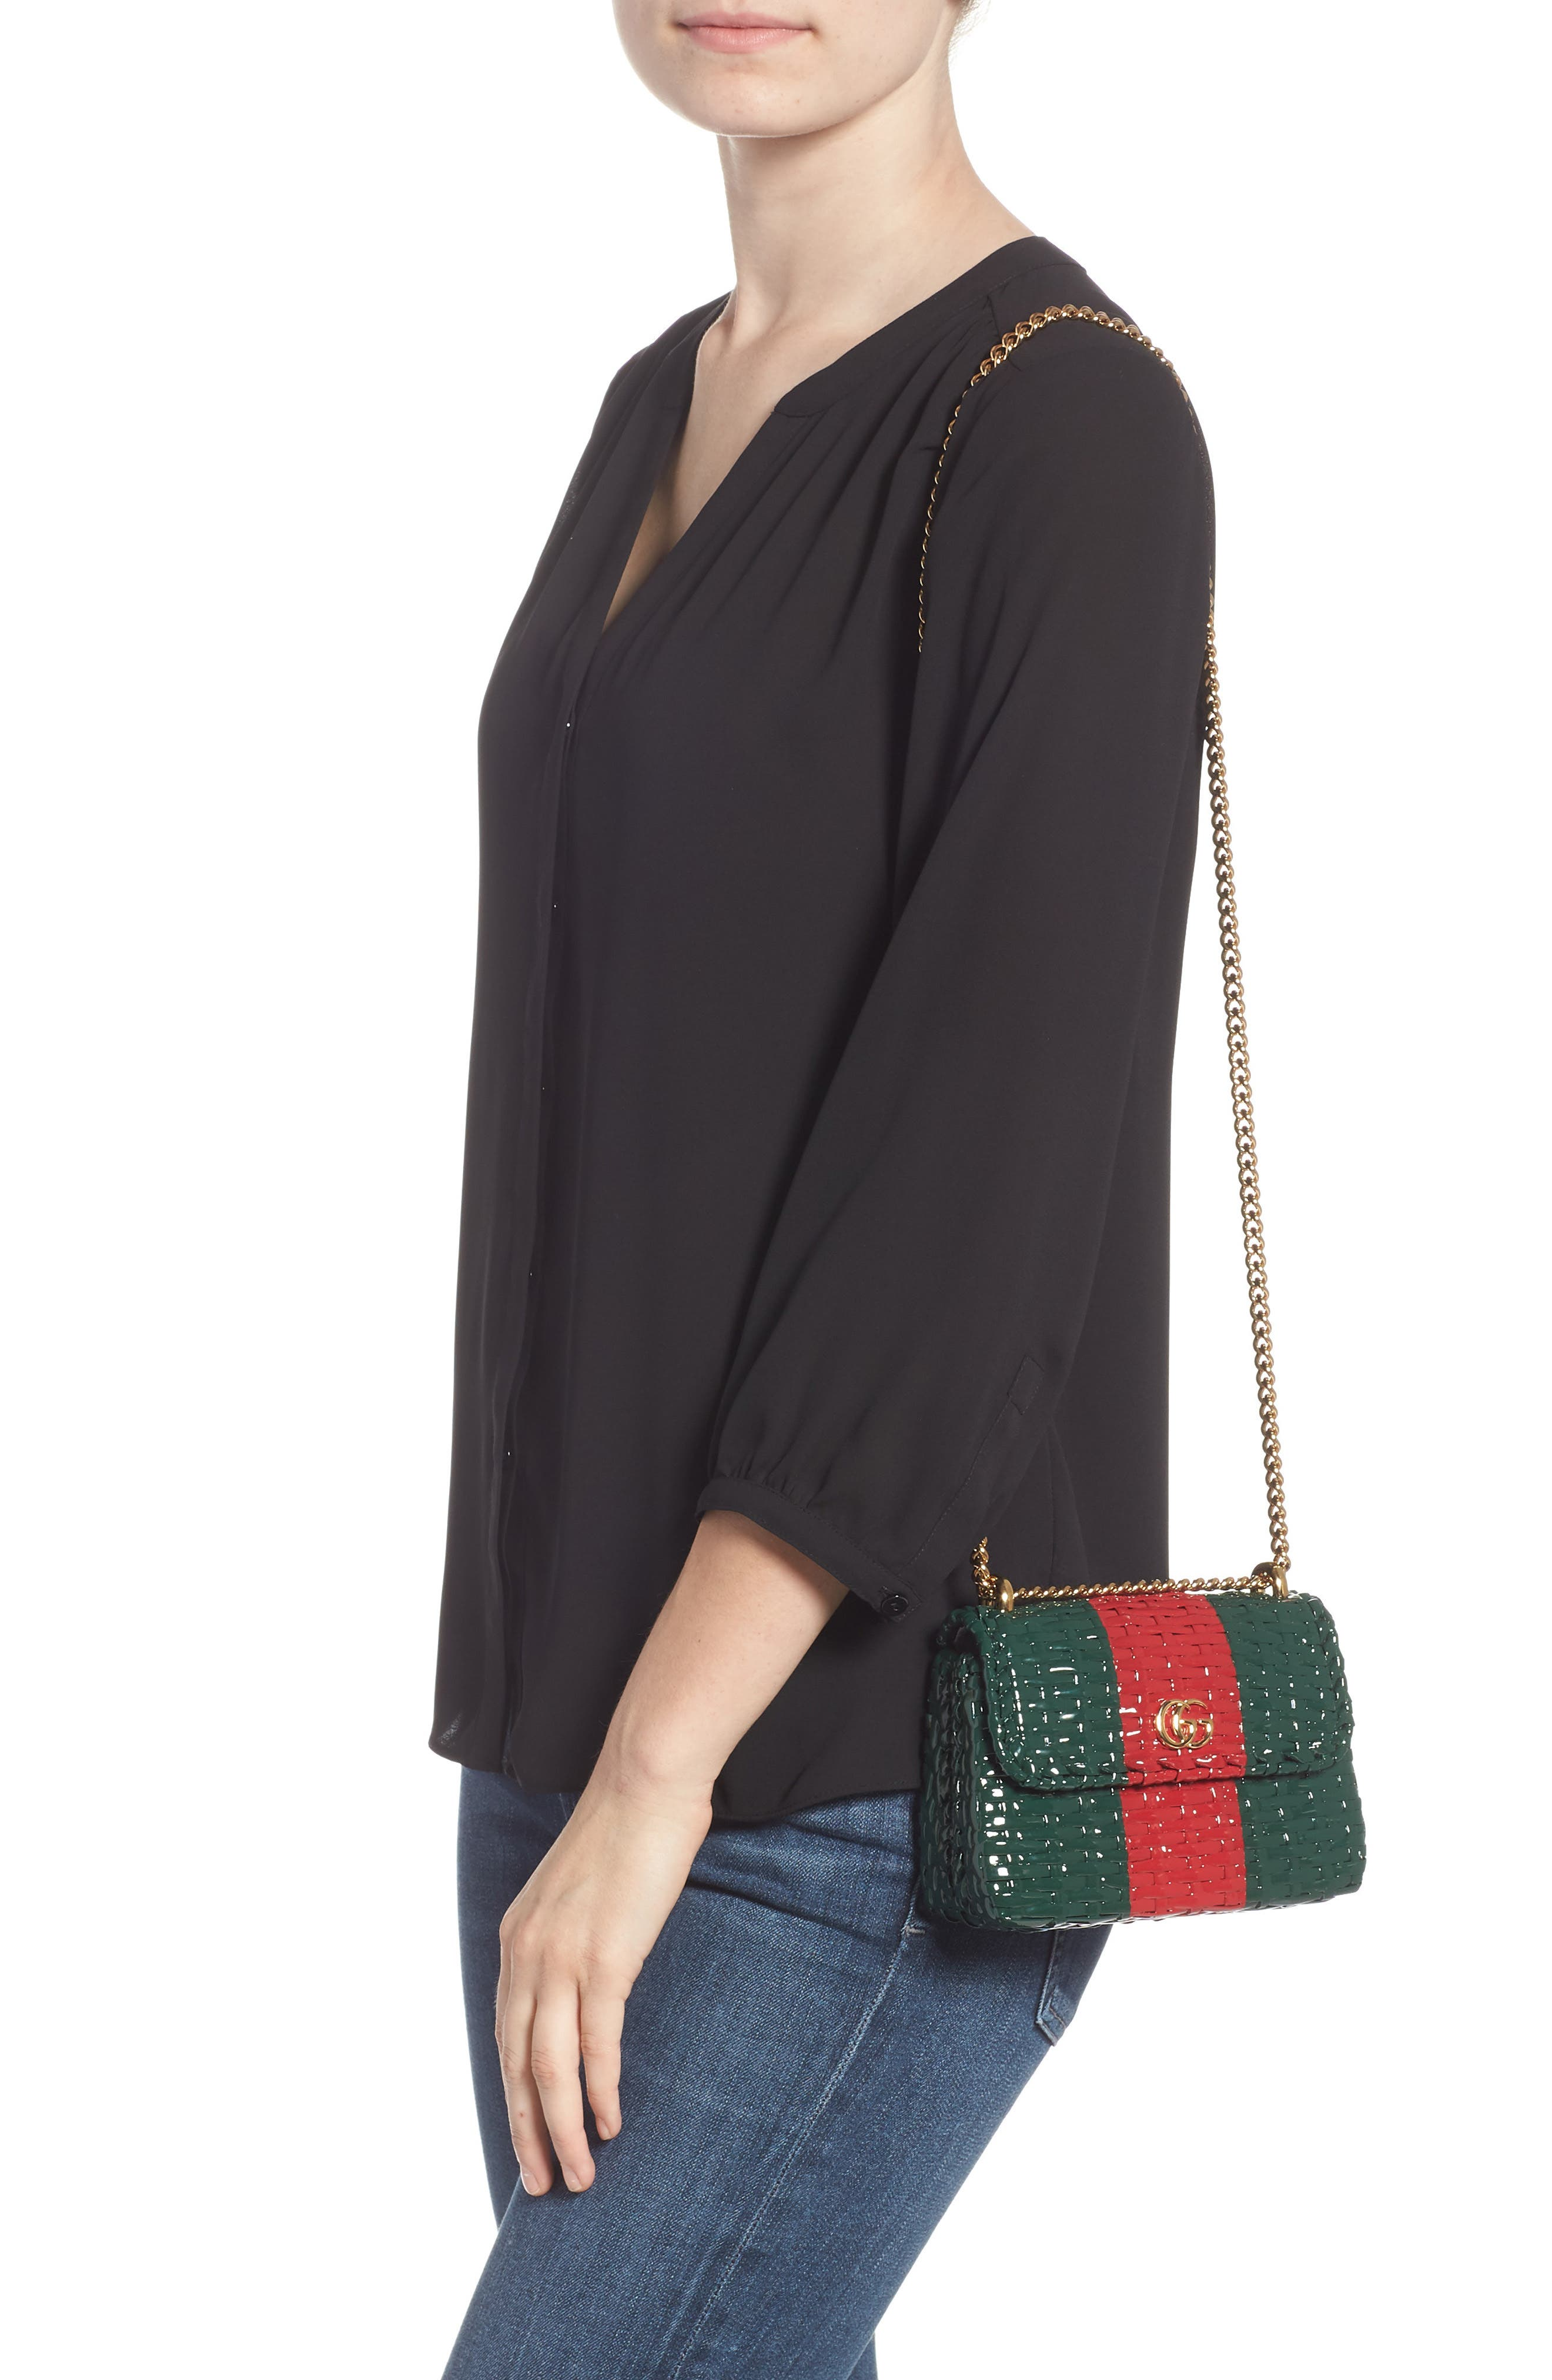 Small Linea Cestino Glazed Wicker Shoulder Bag,                             Alternate thumbnail 2, color,                             VERDE ROSSO VERDE